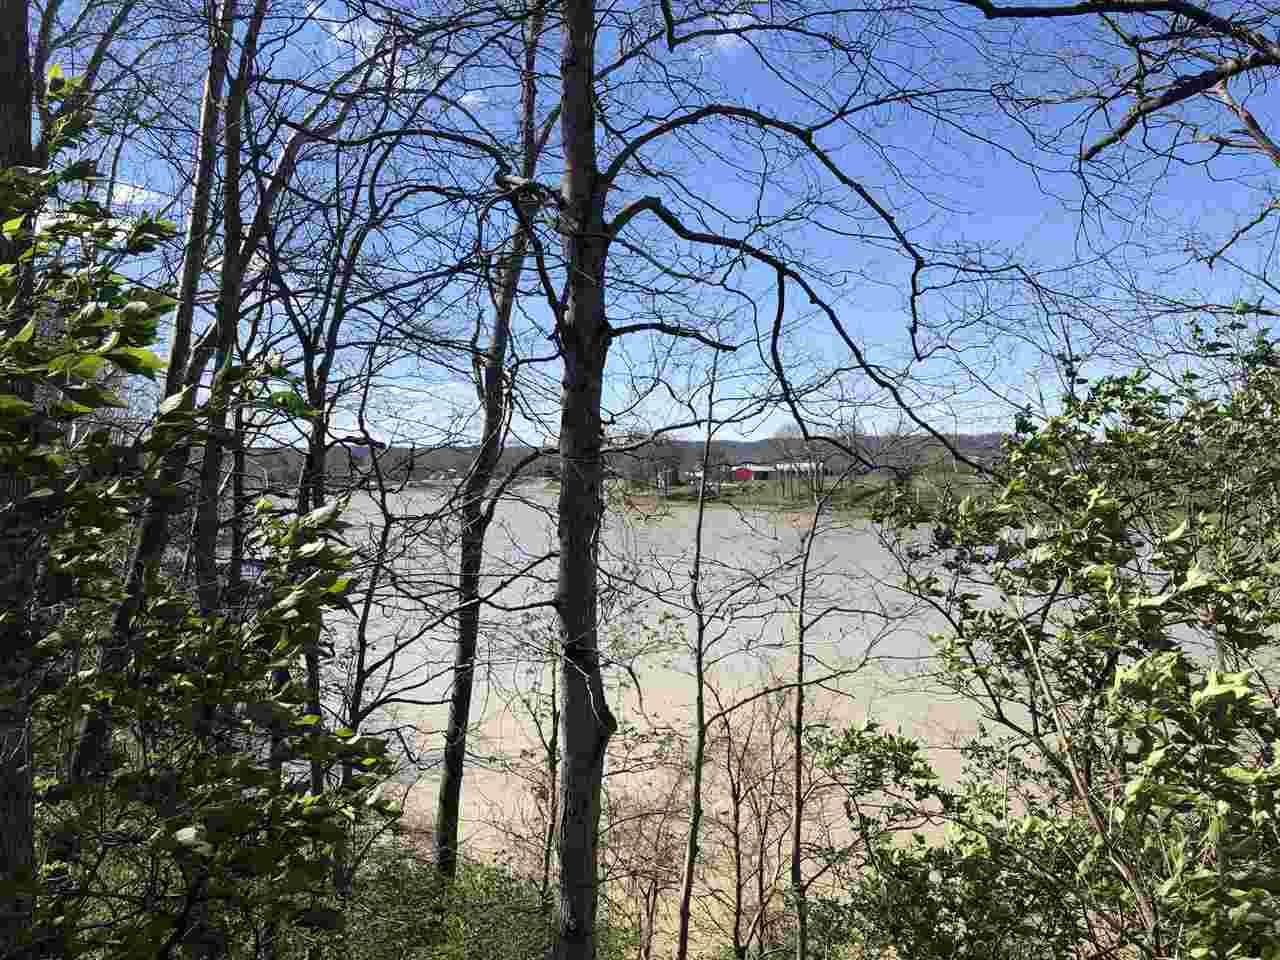 Photo 1 for 17-18-19 Meadow Lark Lane Sparta, KY 41095